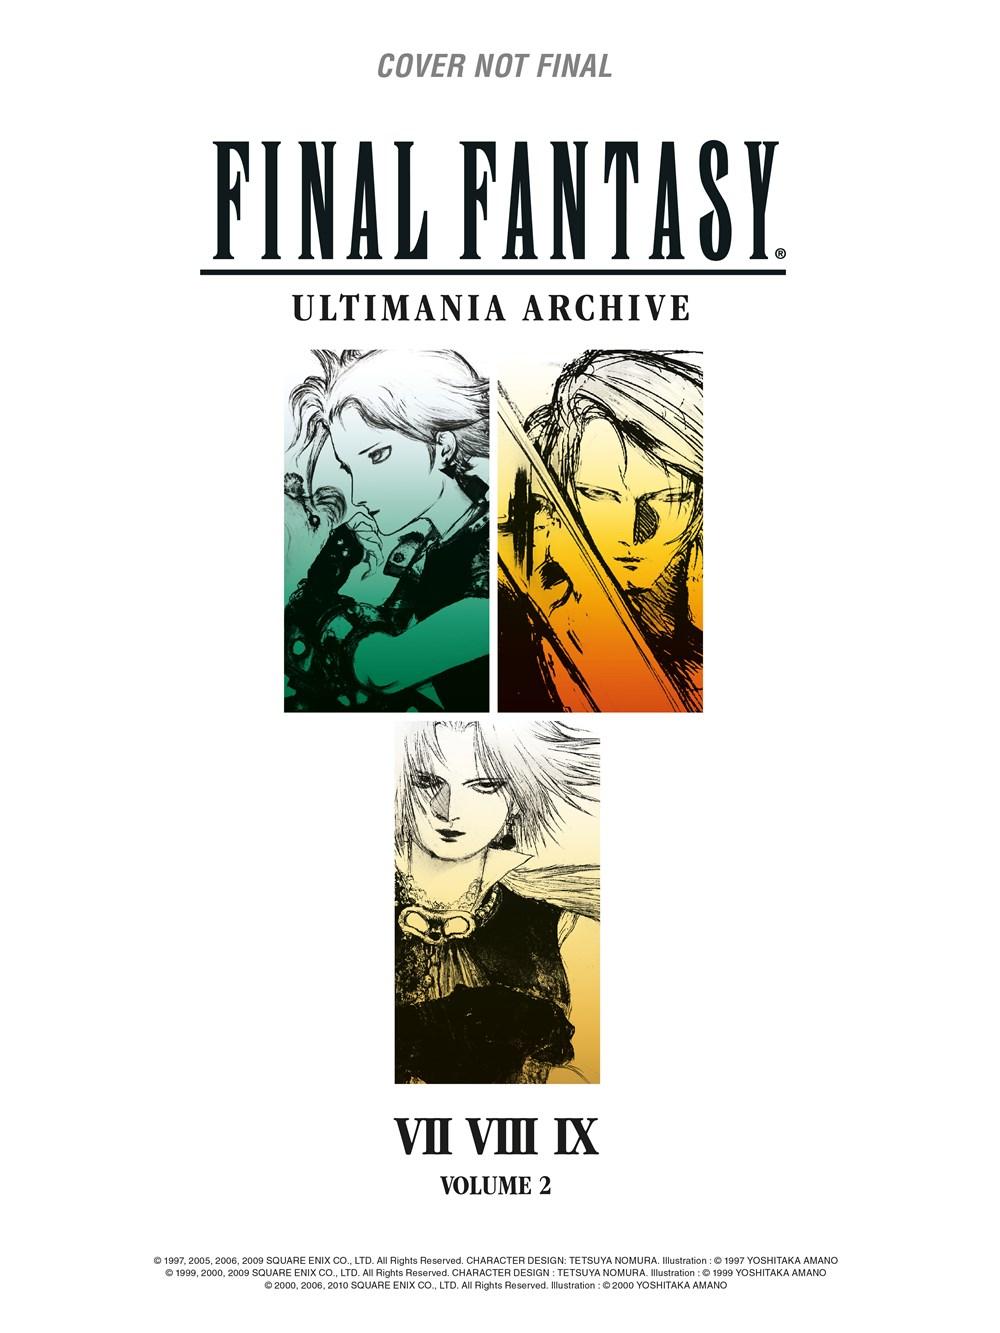 Final Fantasy Ultimania Archive Manga Vol 2